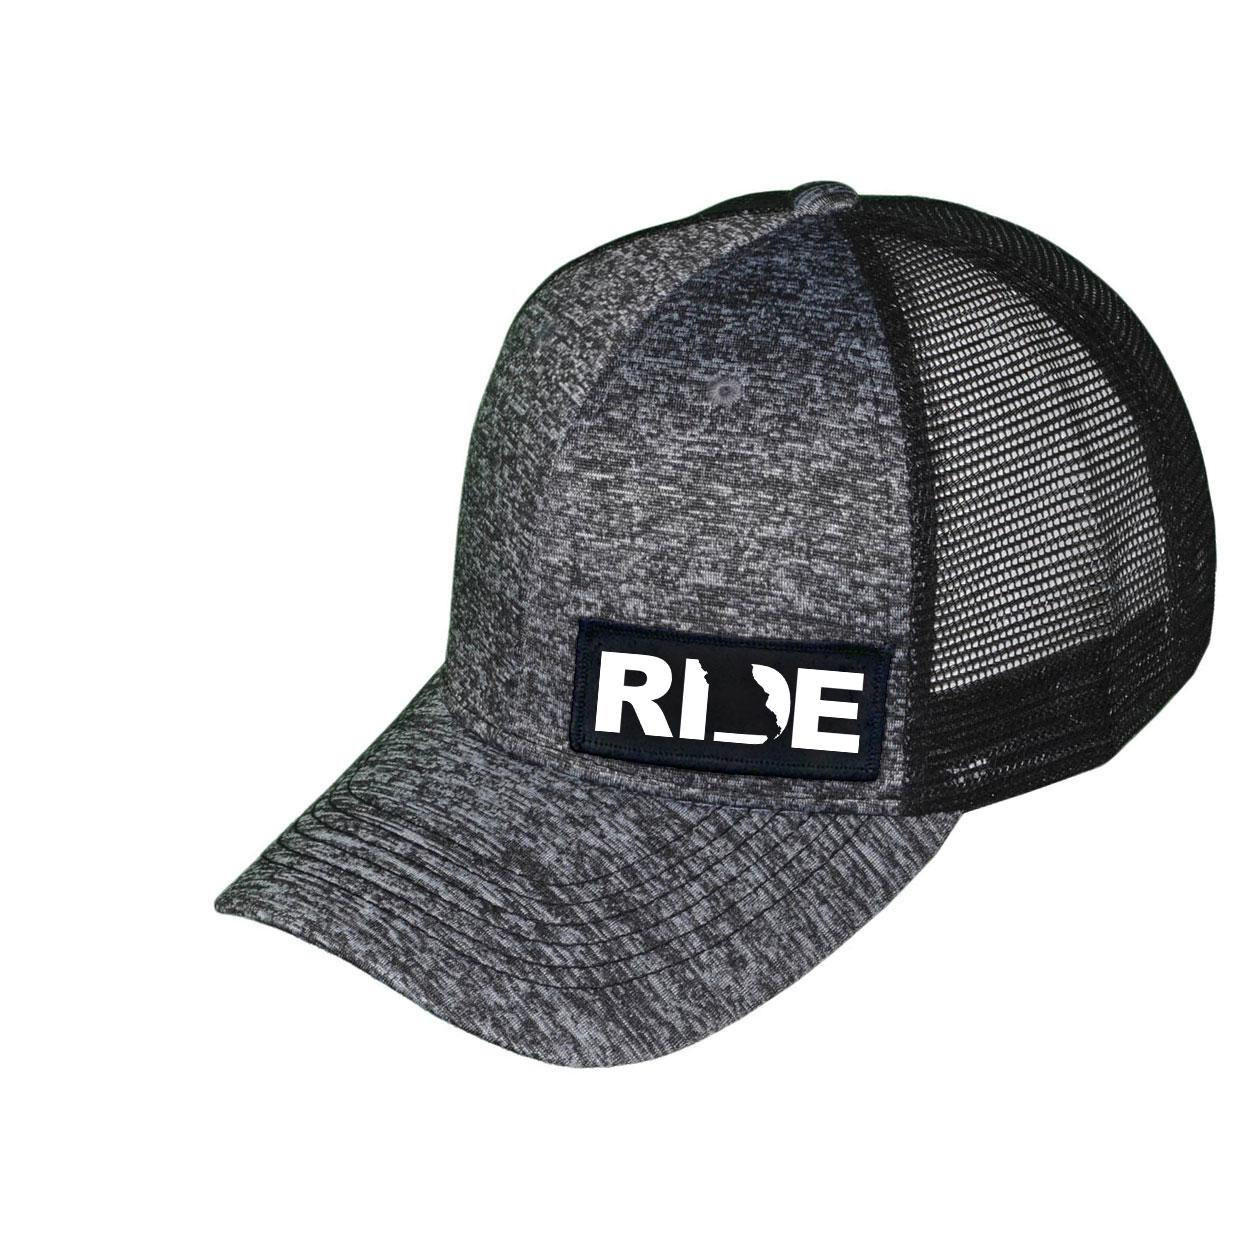 Ride Missouri Night Out Woven Patch Melange Snapback Trucker Hat Gray/Black (White Logo)